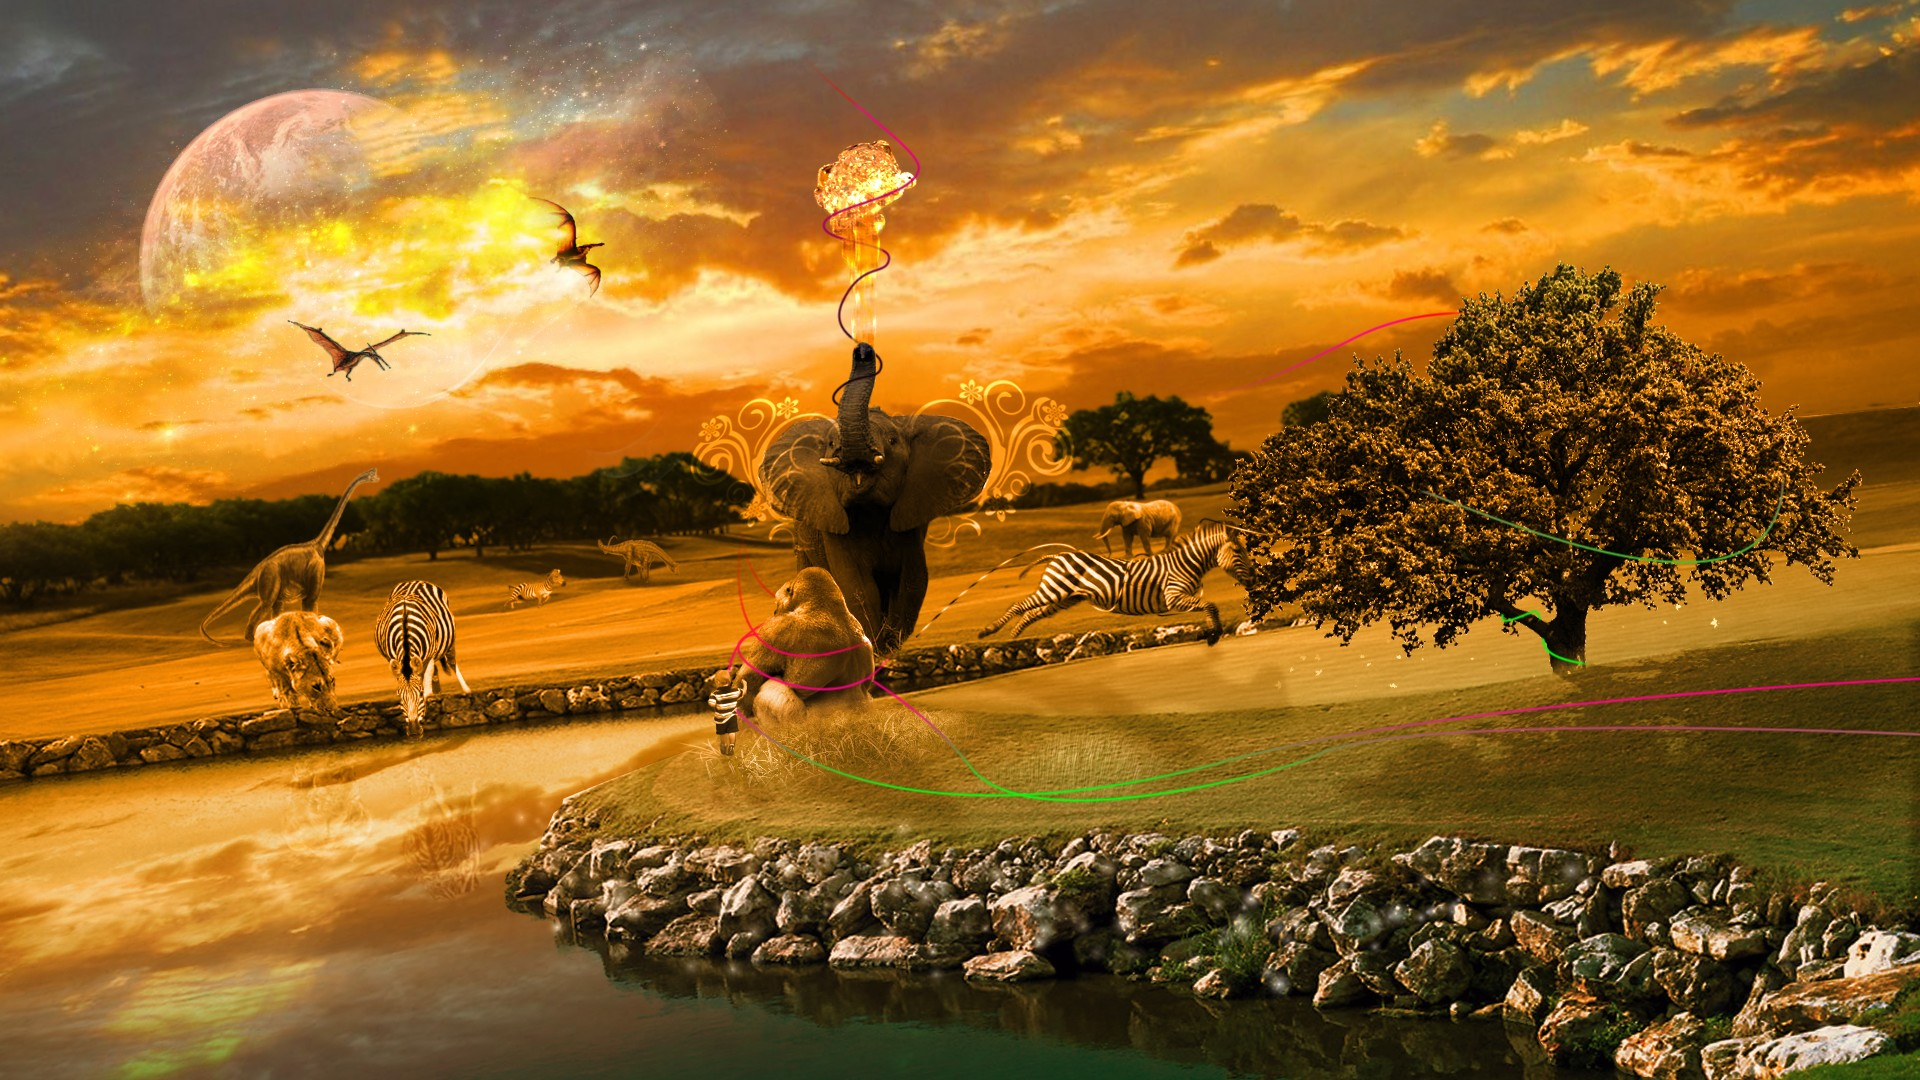 Amazing Africa Wallpaper